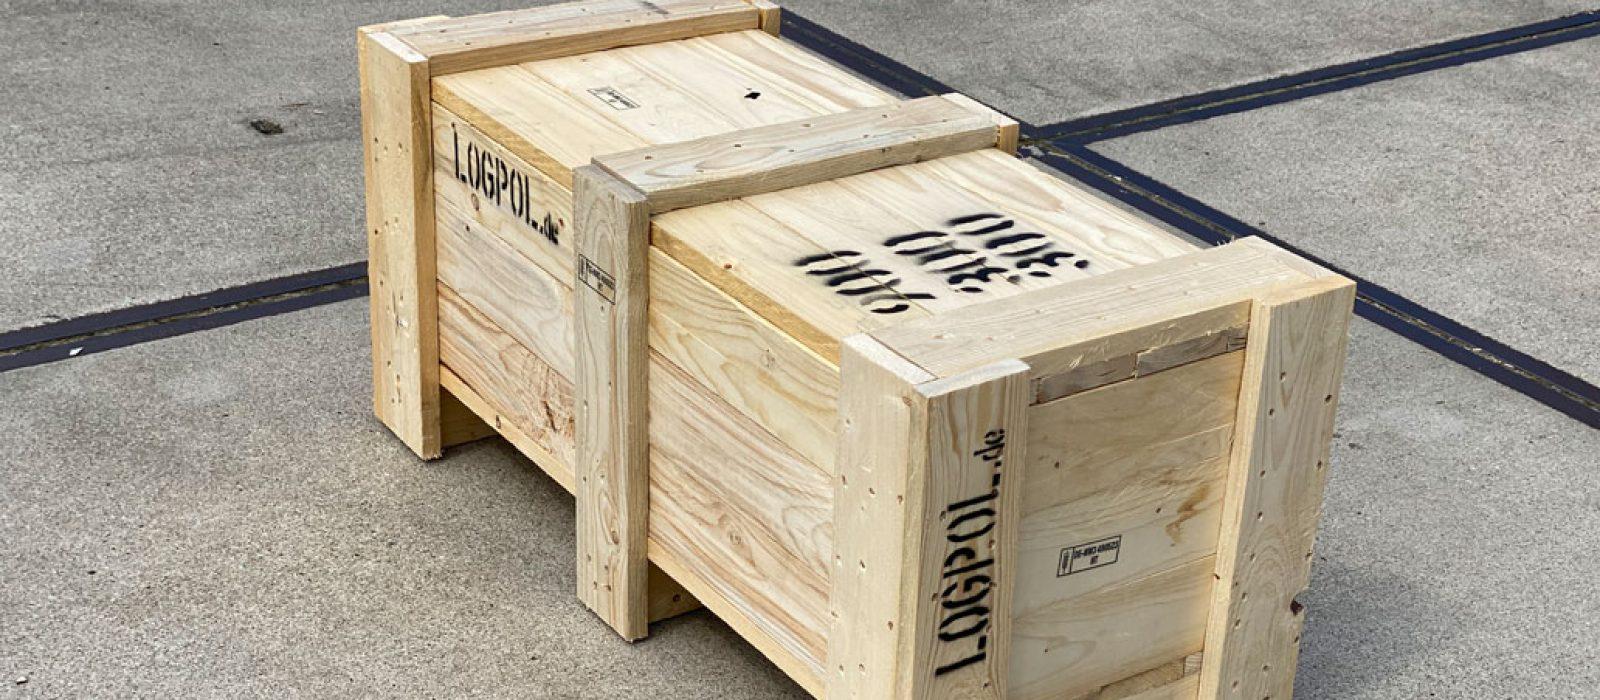 Kiste-900x300x300-LOGPOL